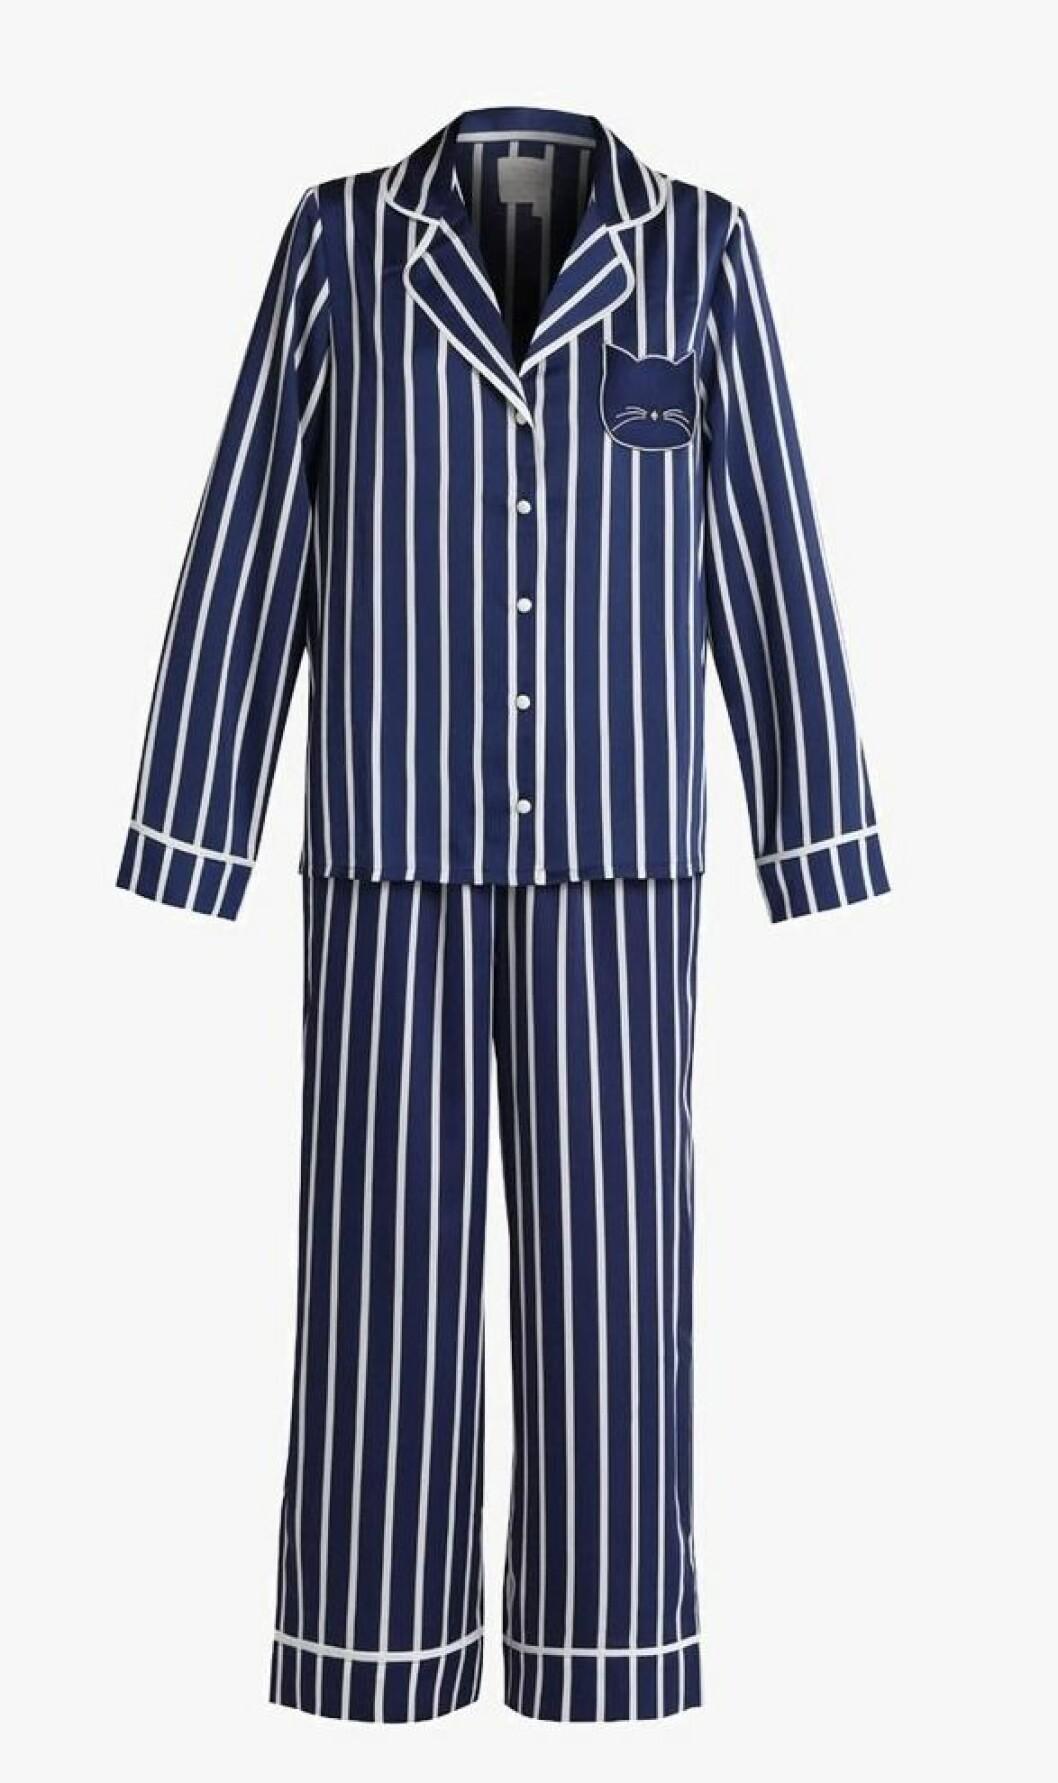 Pysj fra Kate Spade New York |1595,-| https://www.zalando.no/kate-spade-new-york-charmeuse-cropped-set-pyjamas-navy-k0581p00a-k11.html